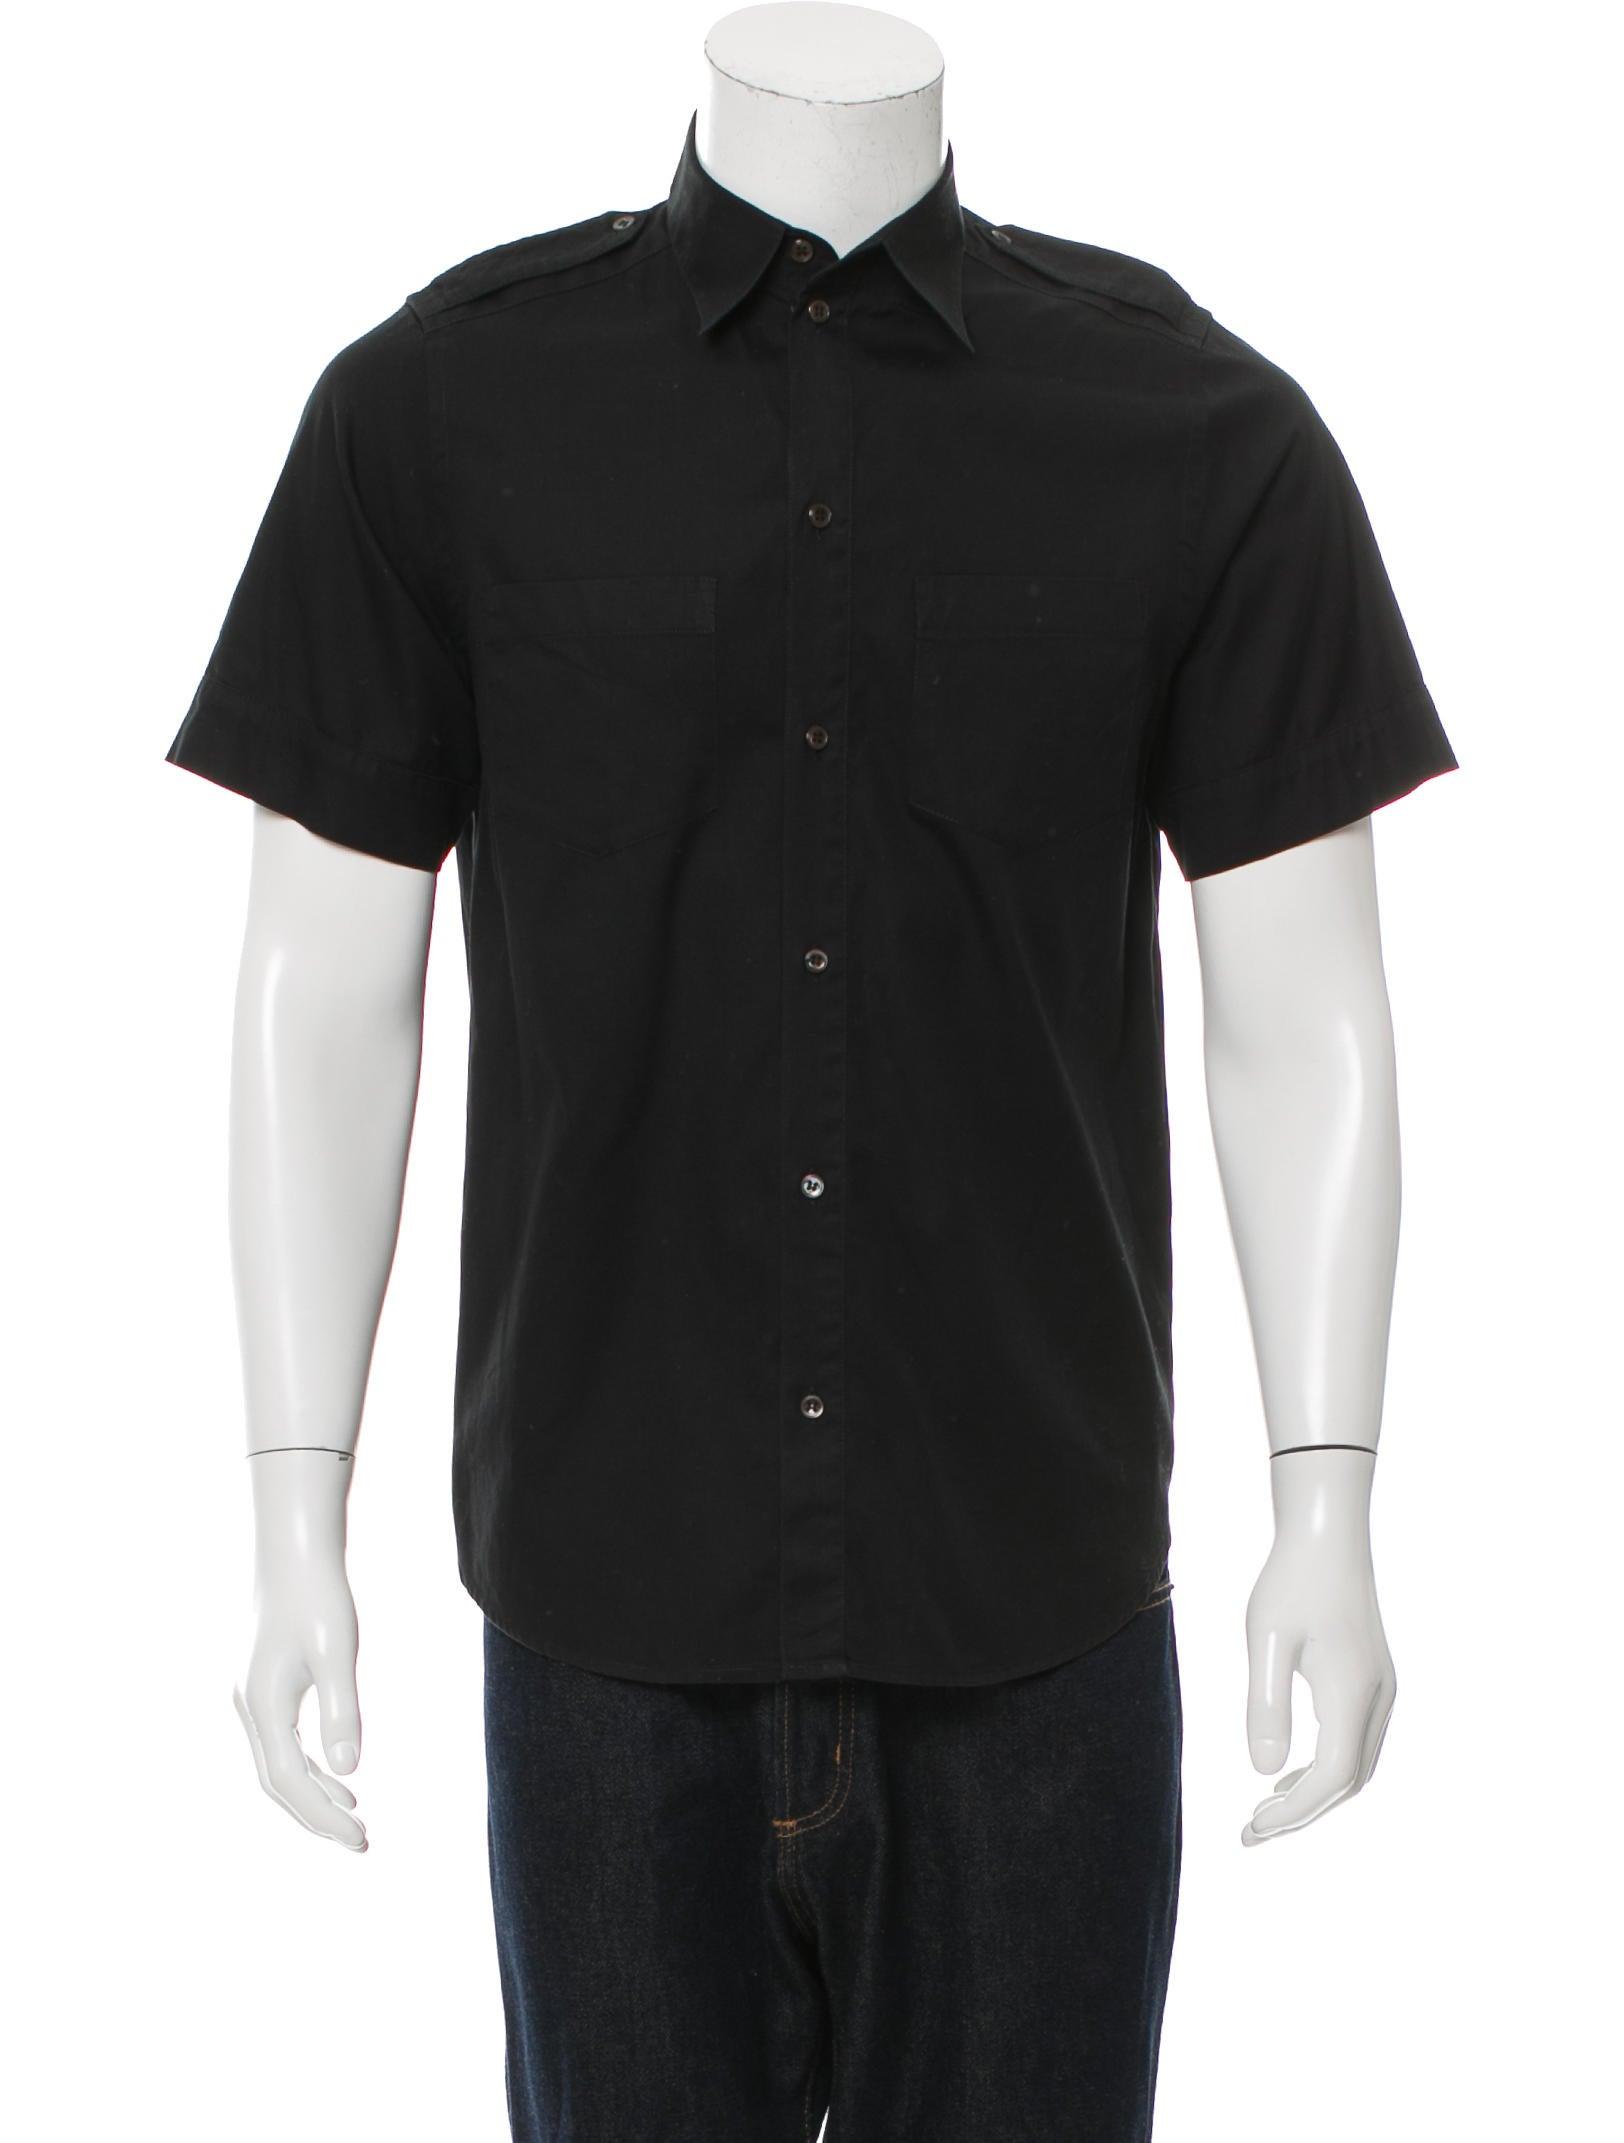 A p c short sleeve button up shirt clothing wa325079 Short sleeve button shirt